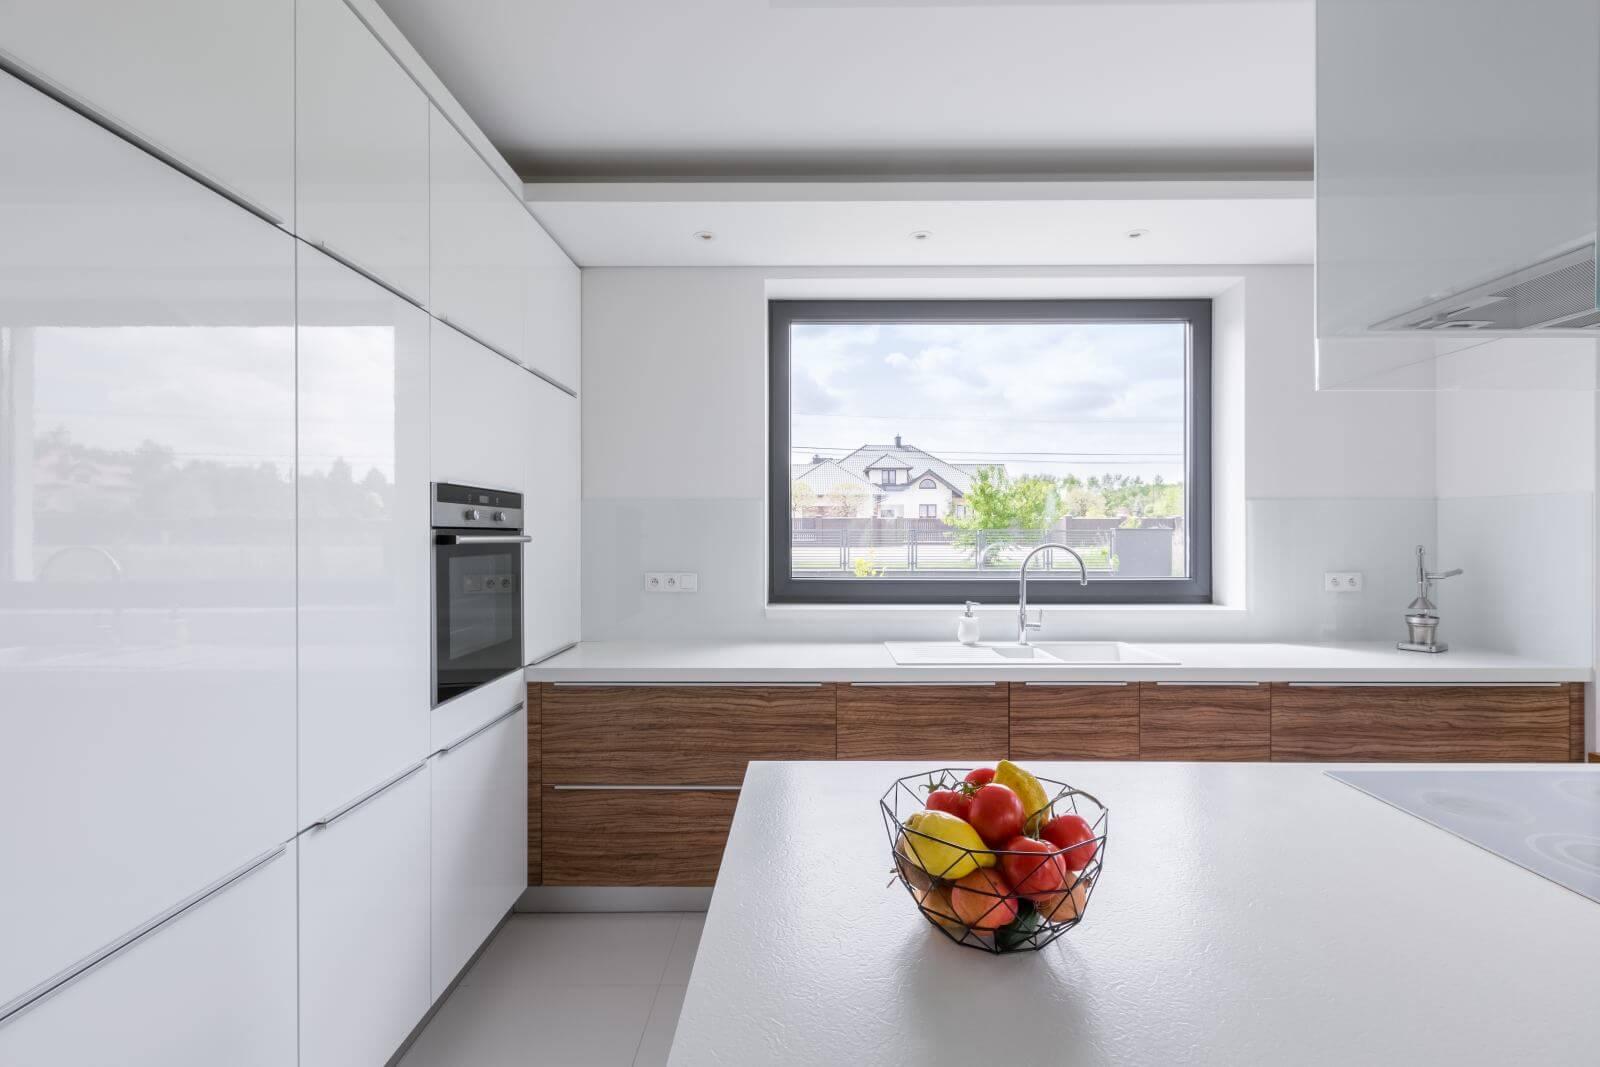 Modern design, white kitchen with island and big window